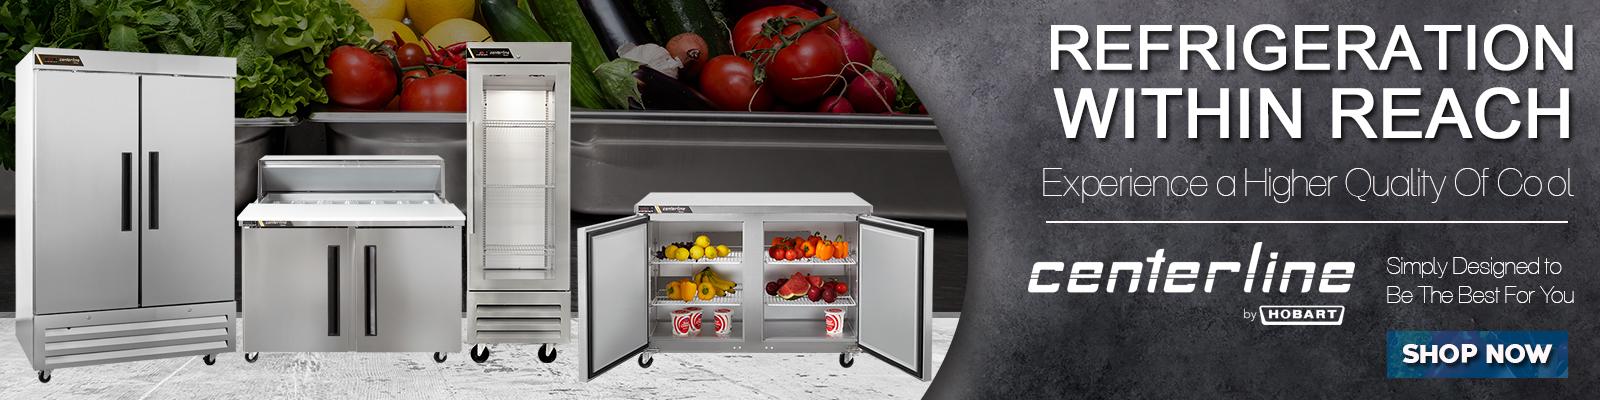 Centerline Commercial Refrigeration, Commercial Refrigeration Equipment